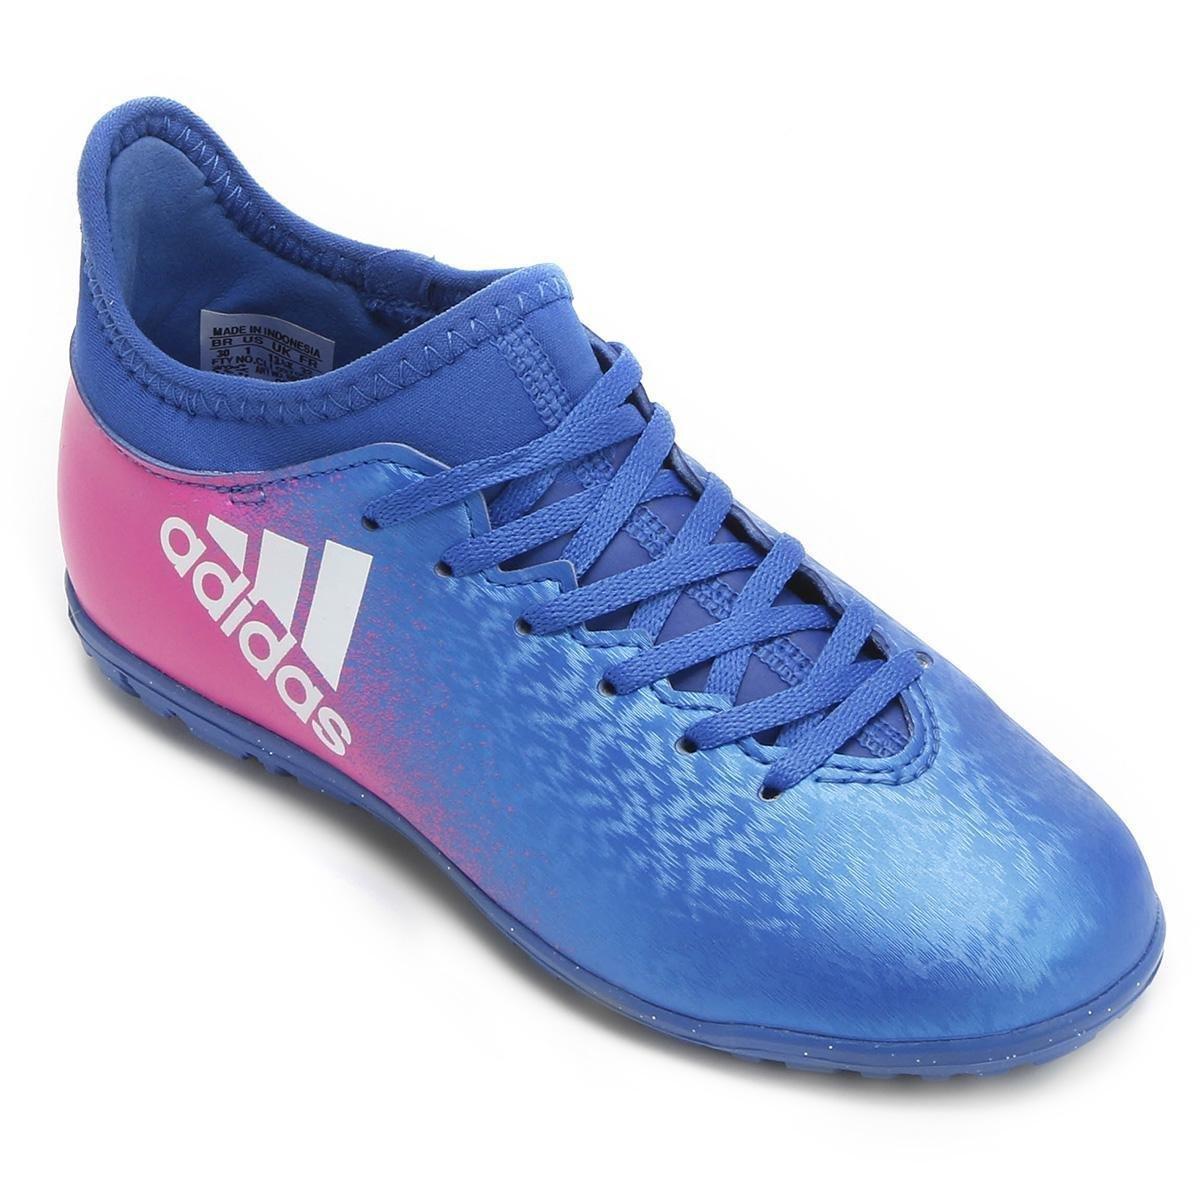 0333fc6b4d766 Chuteira Adidas X 16.3 TF Society Juvenil - Compre Agora